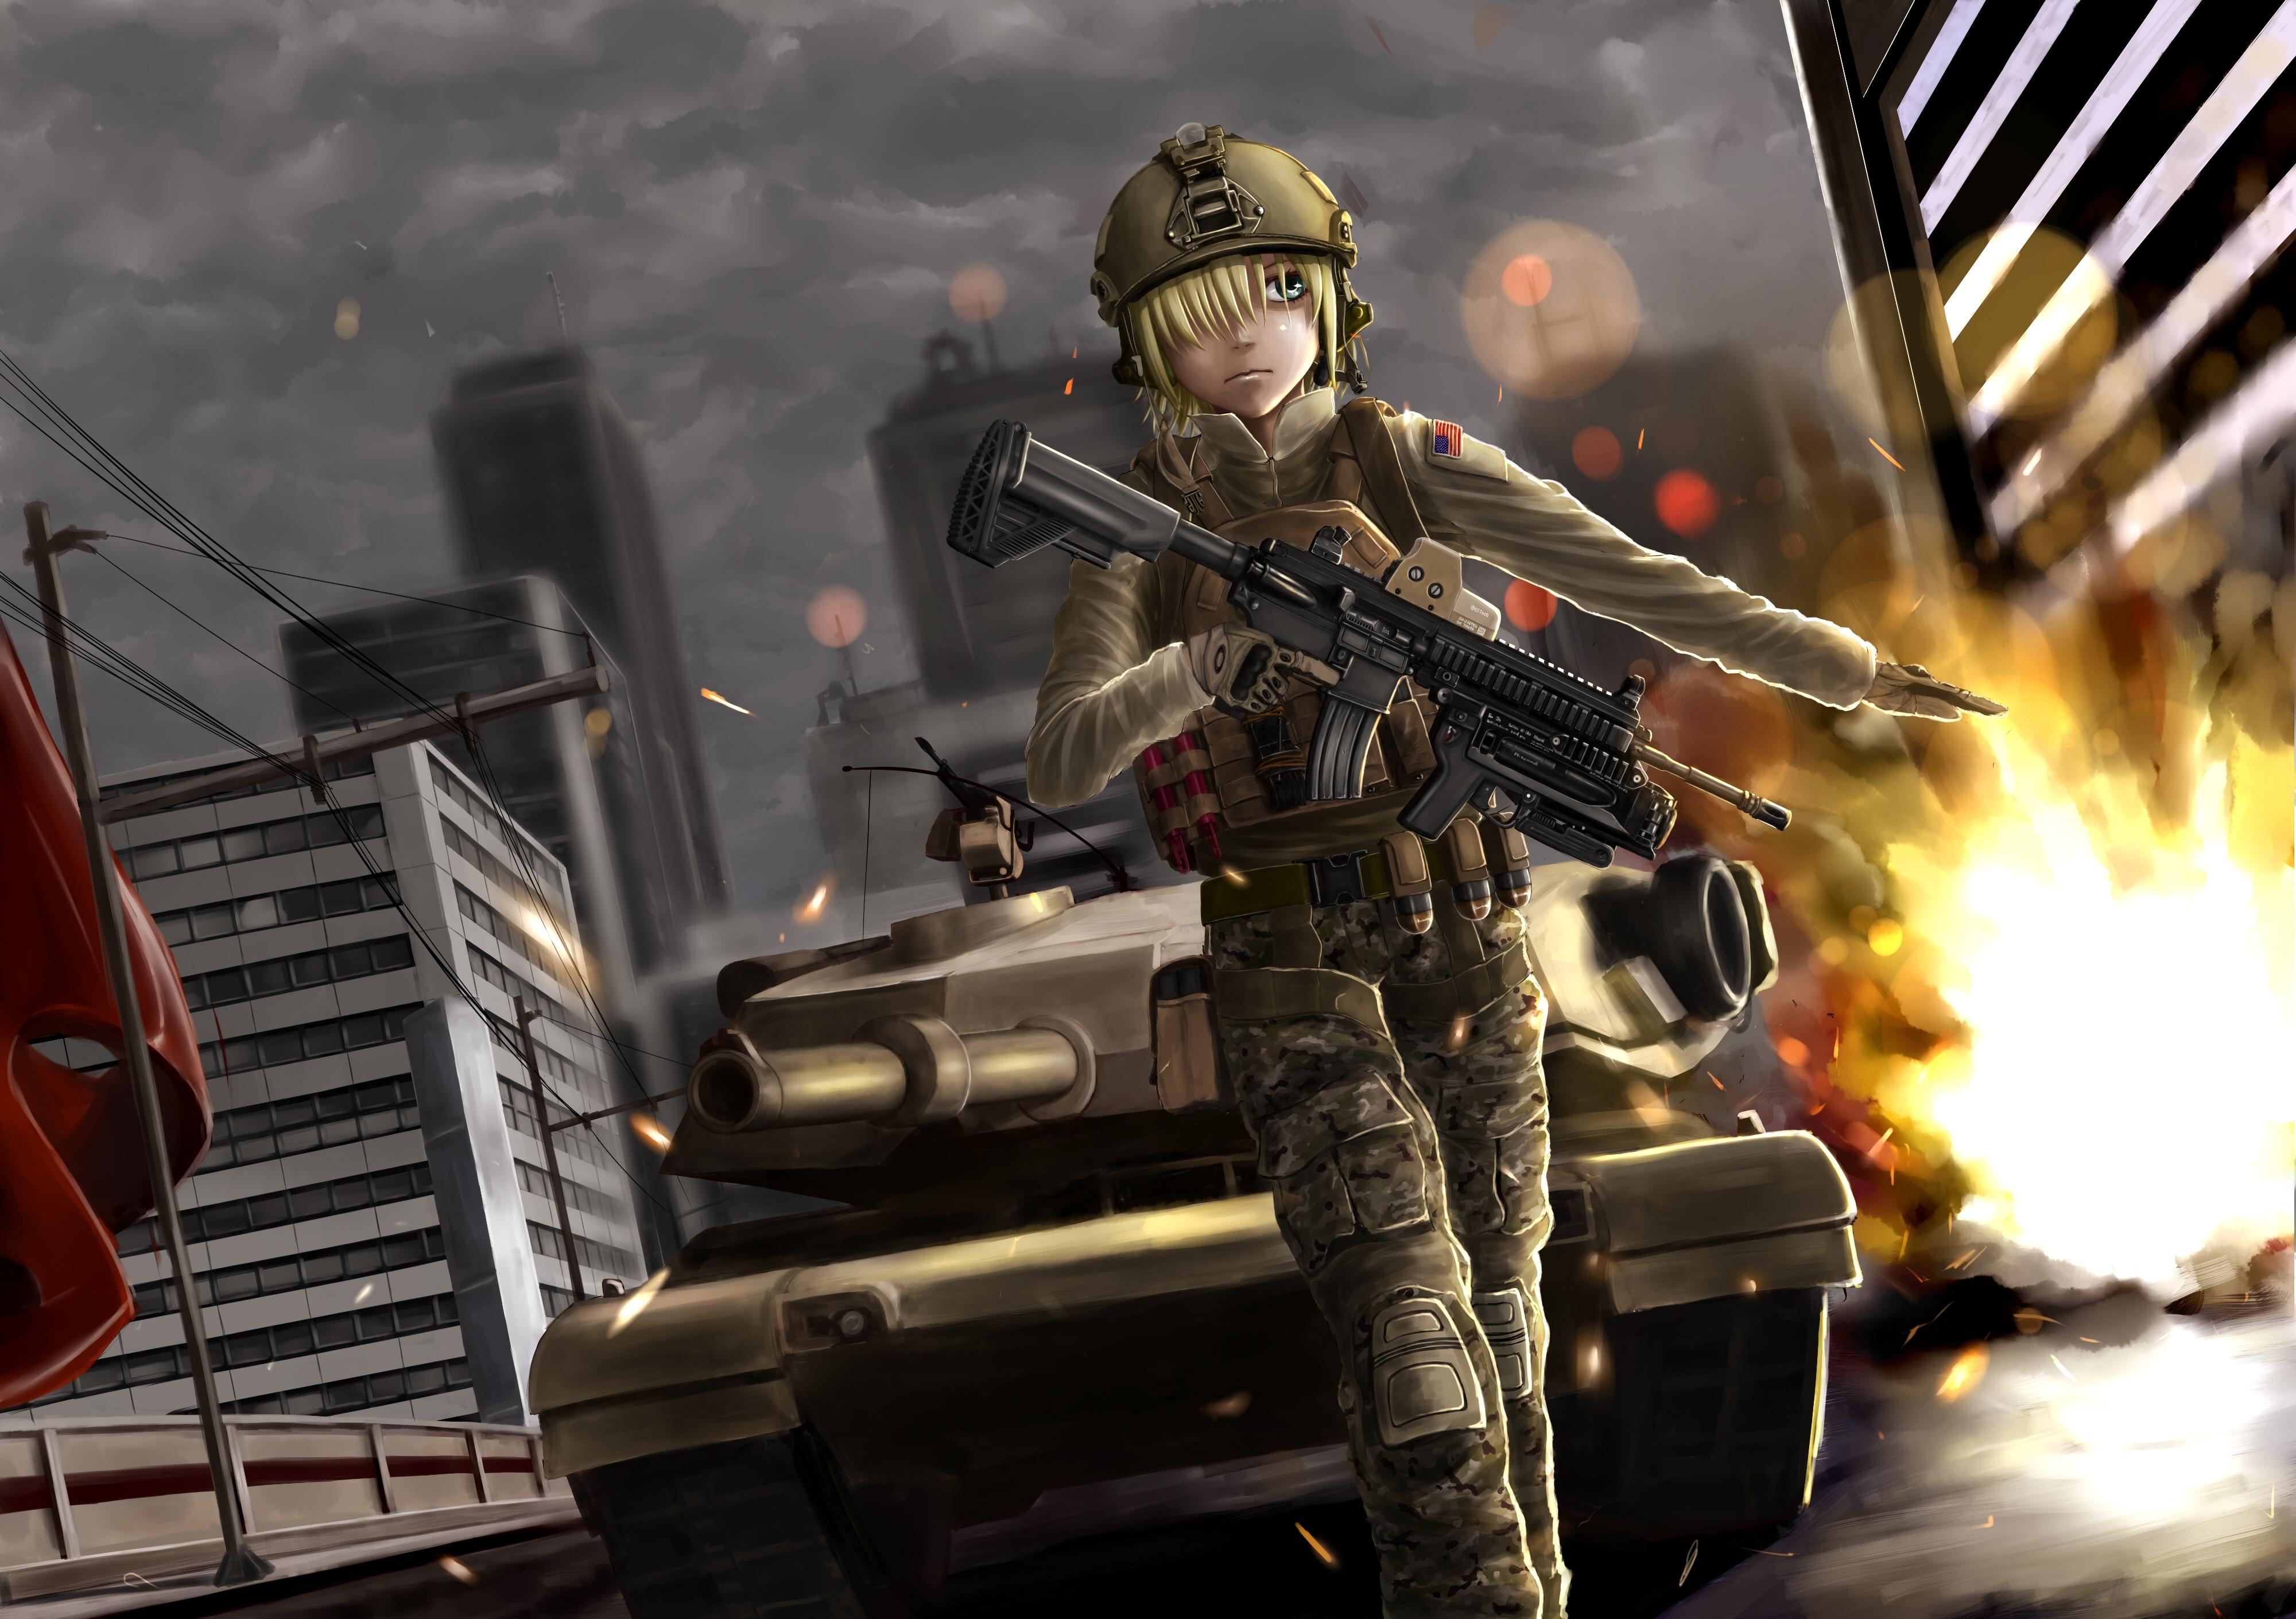 Original 4k Ultra Hd Wallpaper Anime Soldier 1226506